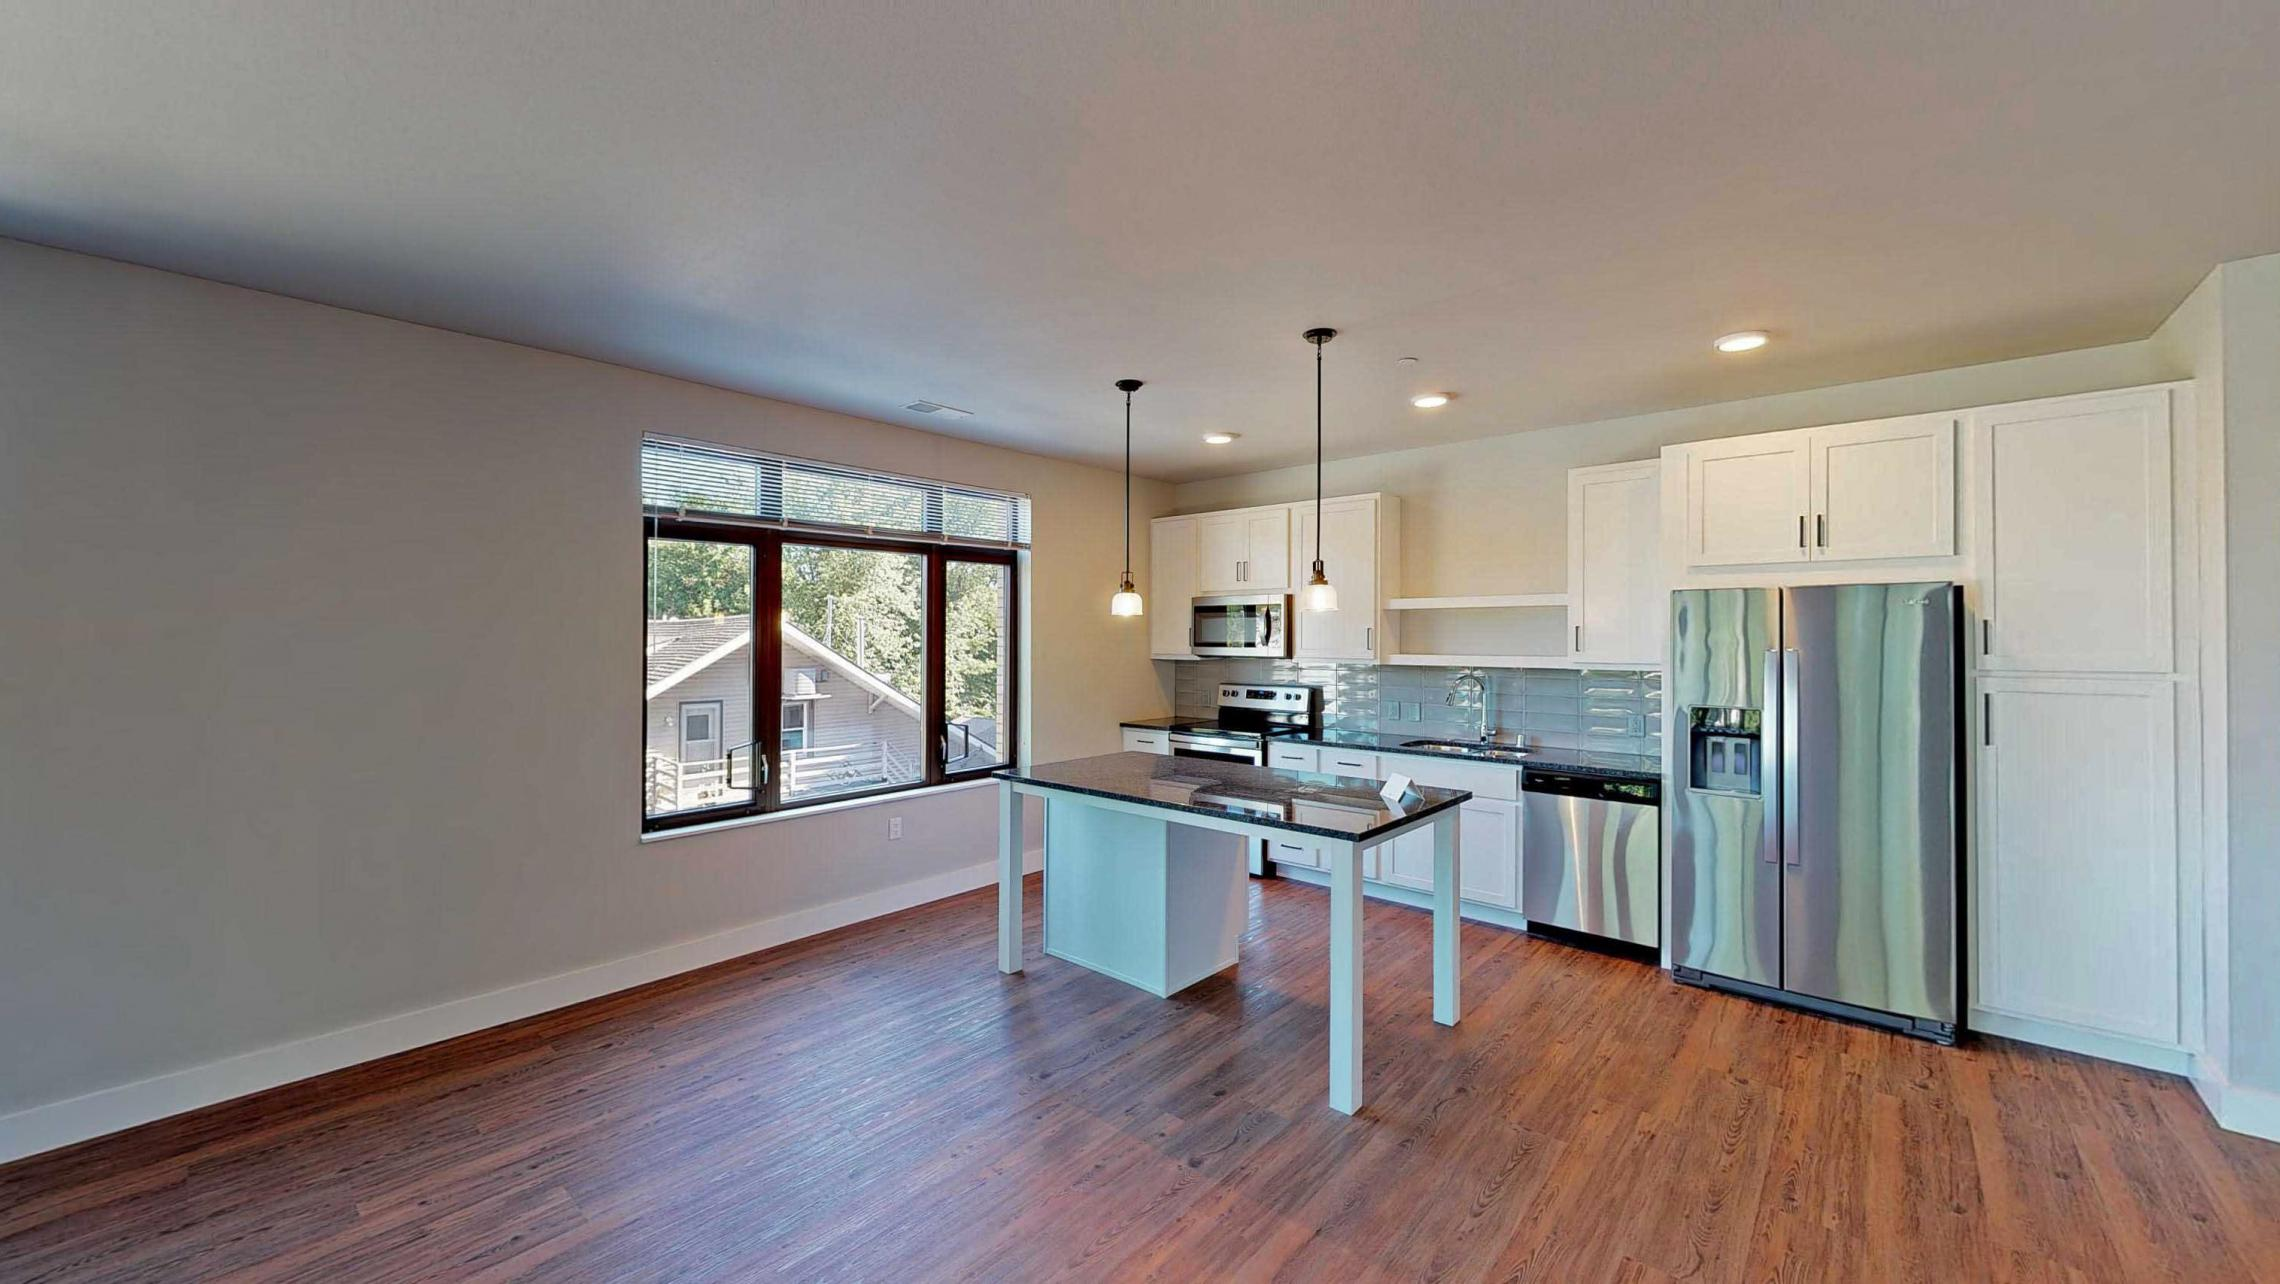 1722-Monroe-Apartment-220-Three Bedroom-Modern-Luxury-Corner-Balcony-Urban Living-Kitchen